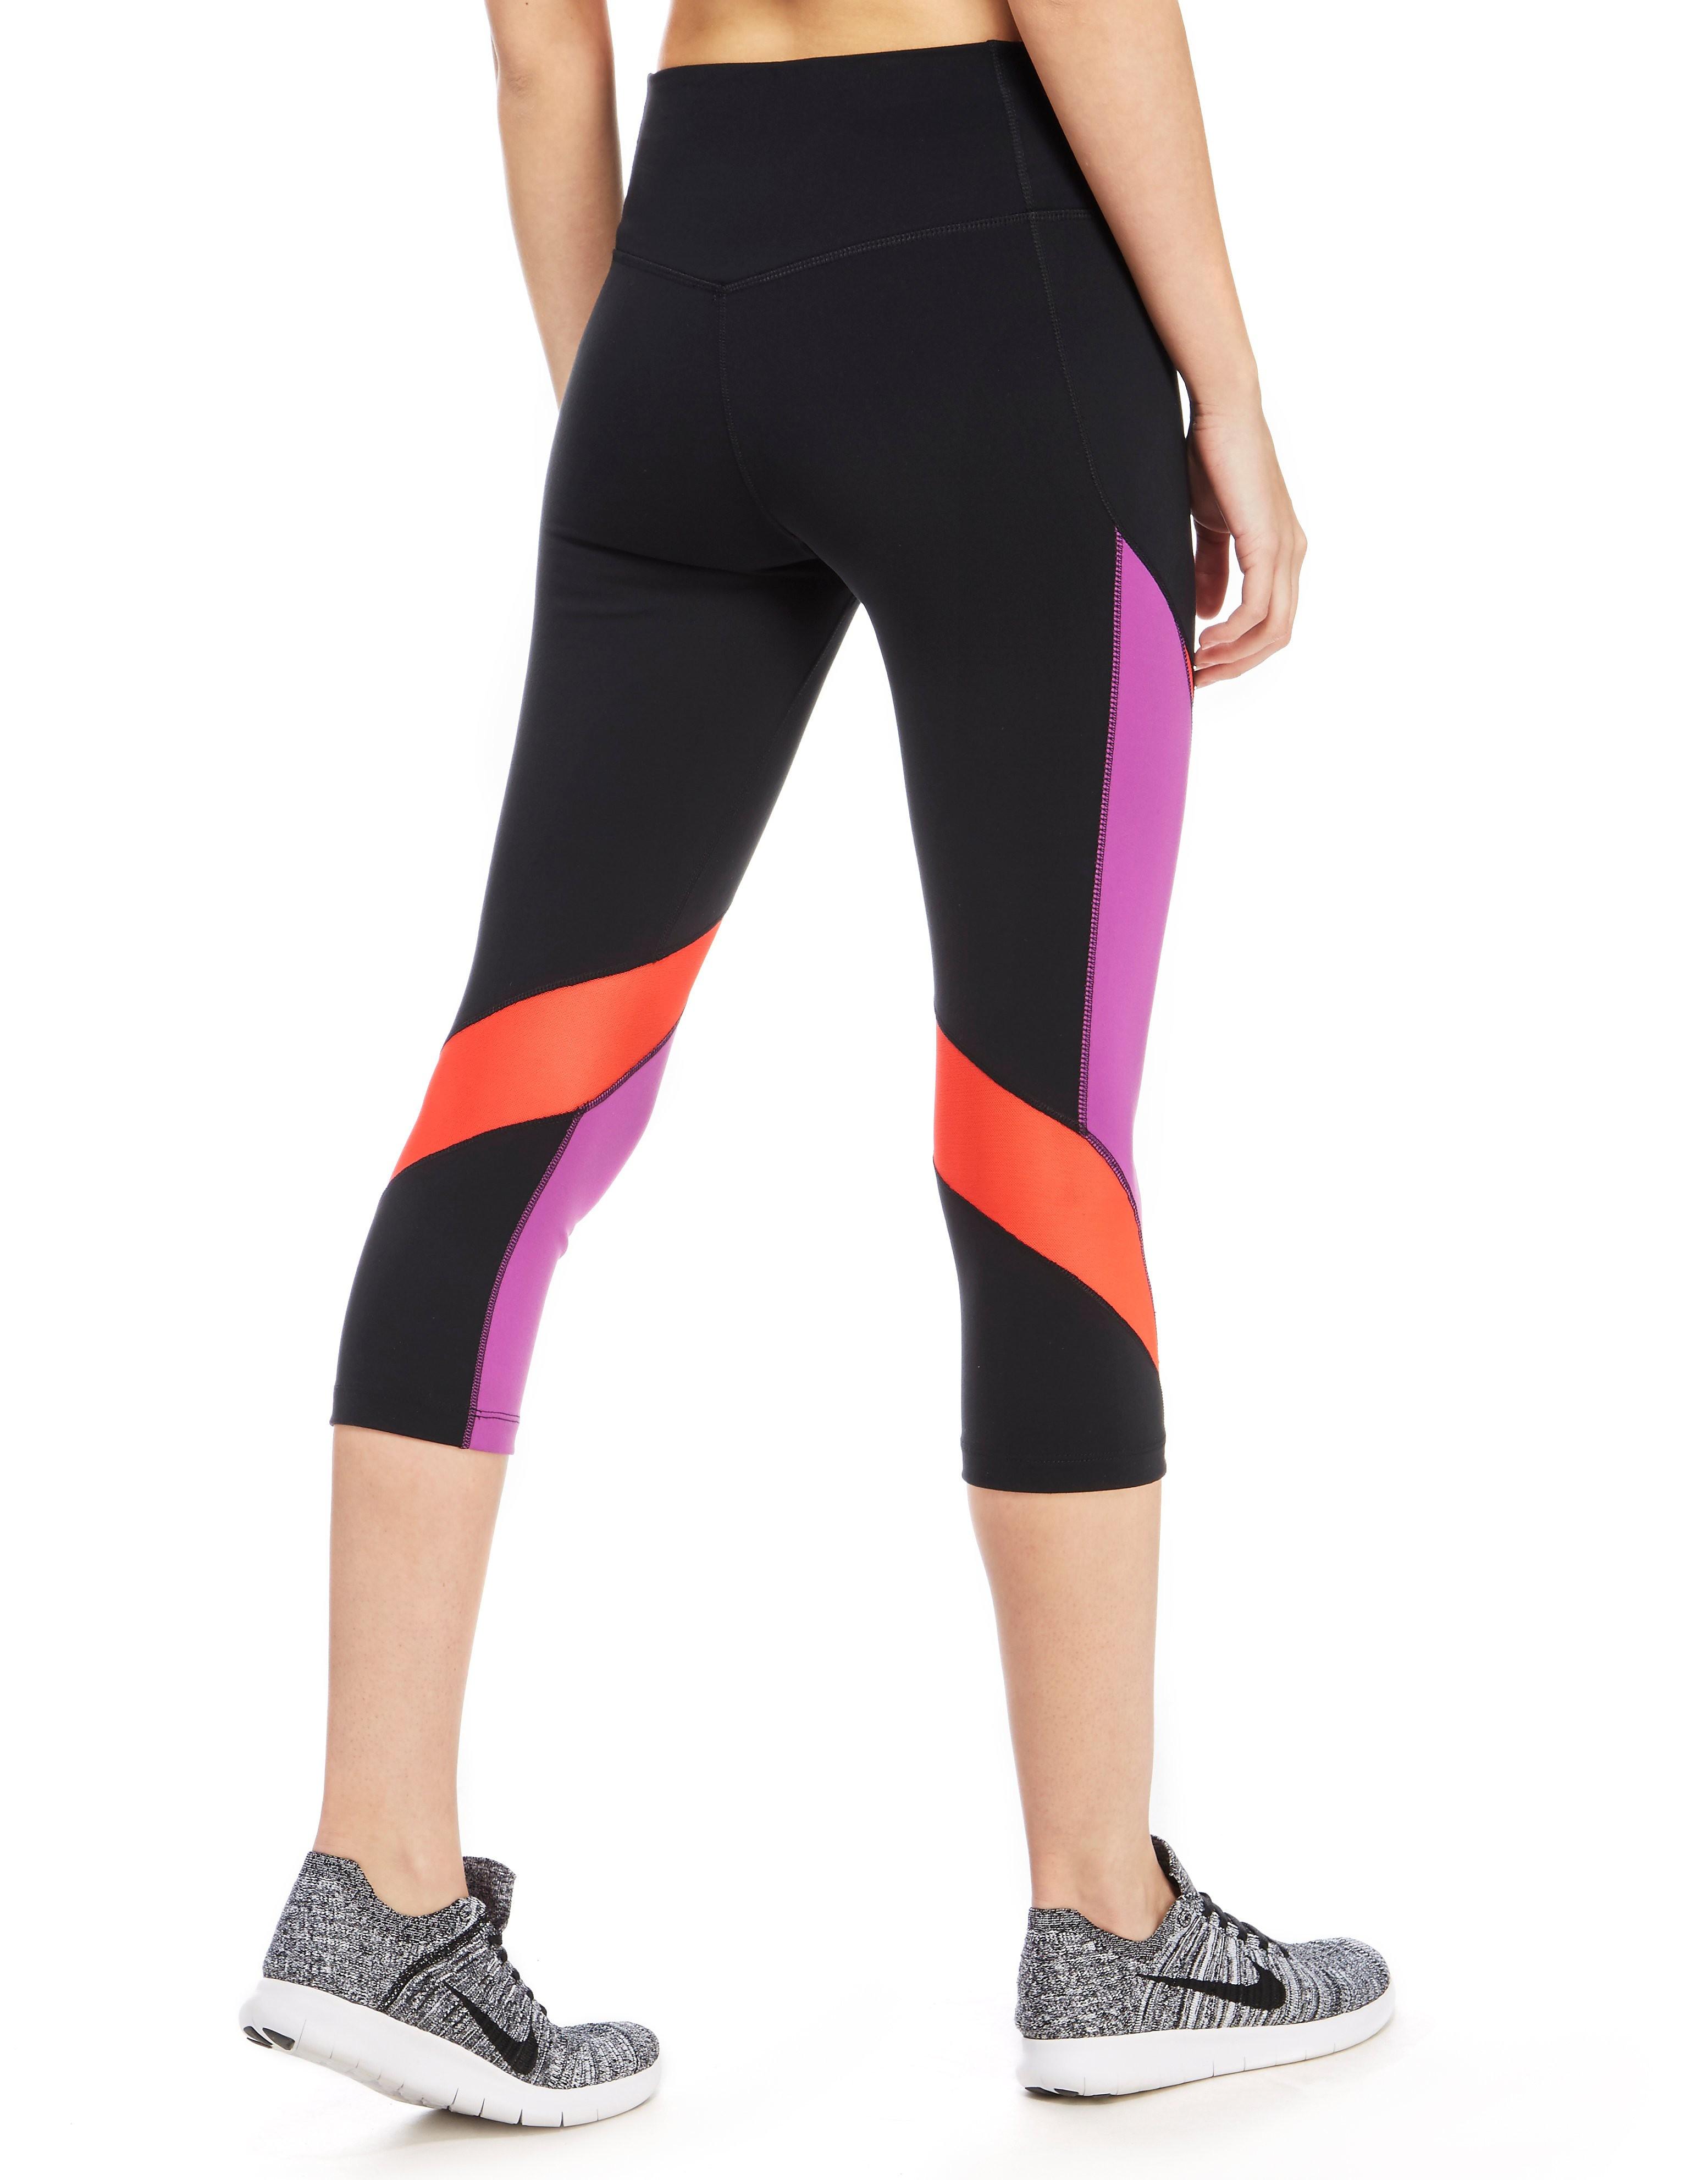 Nike Legendary Fabric Twist Capris